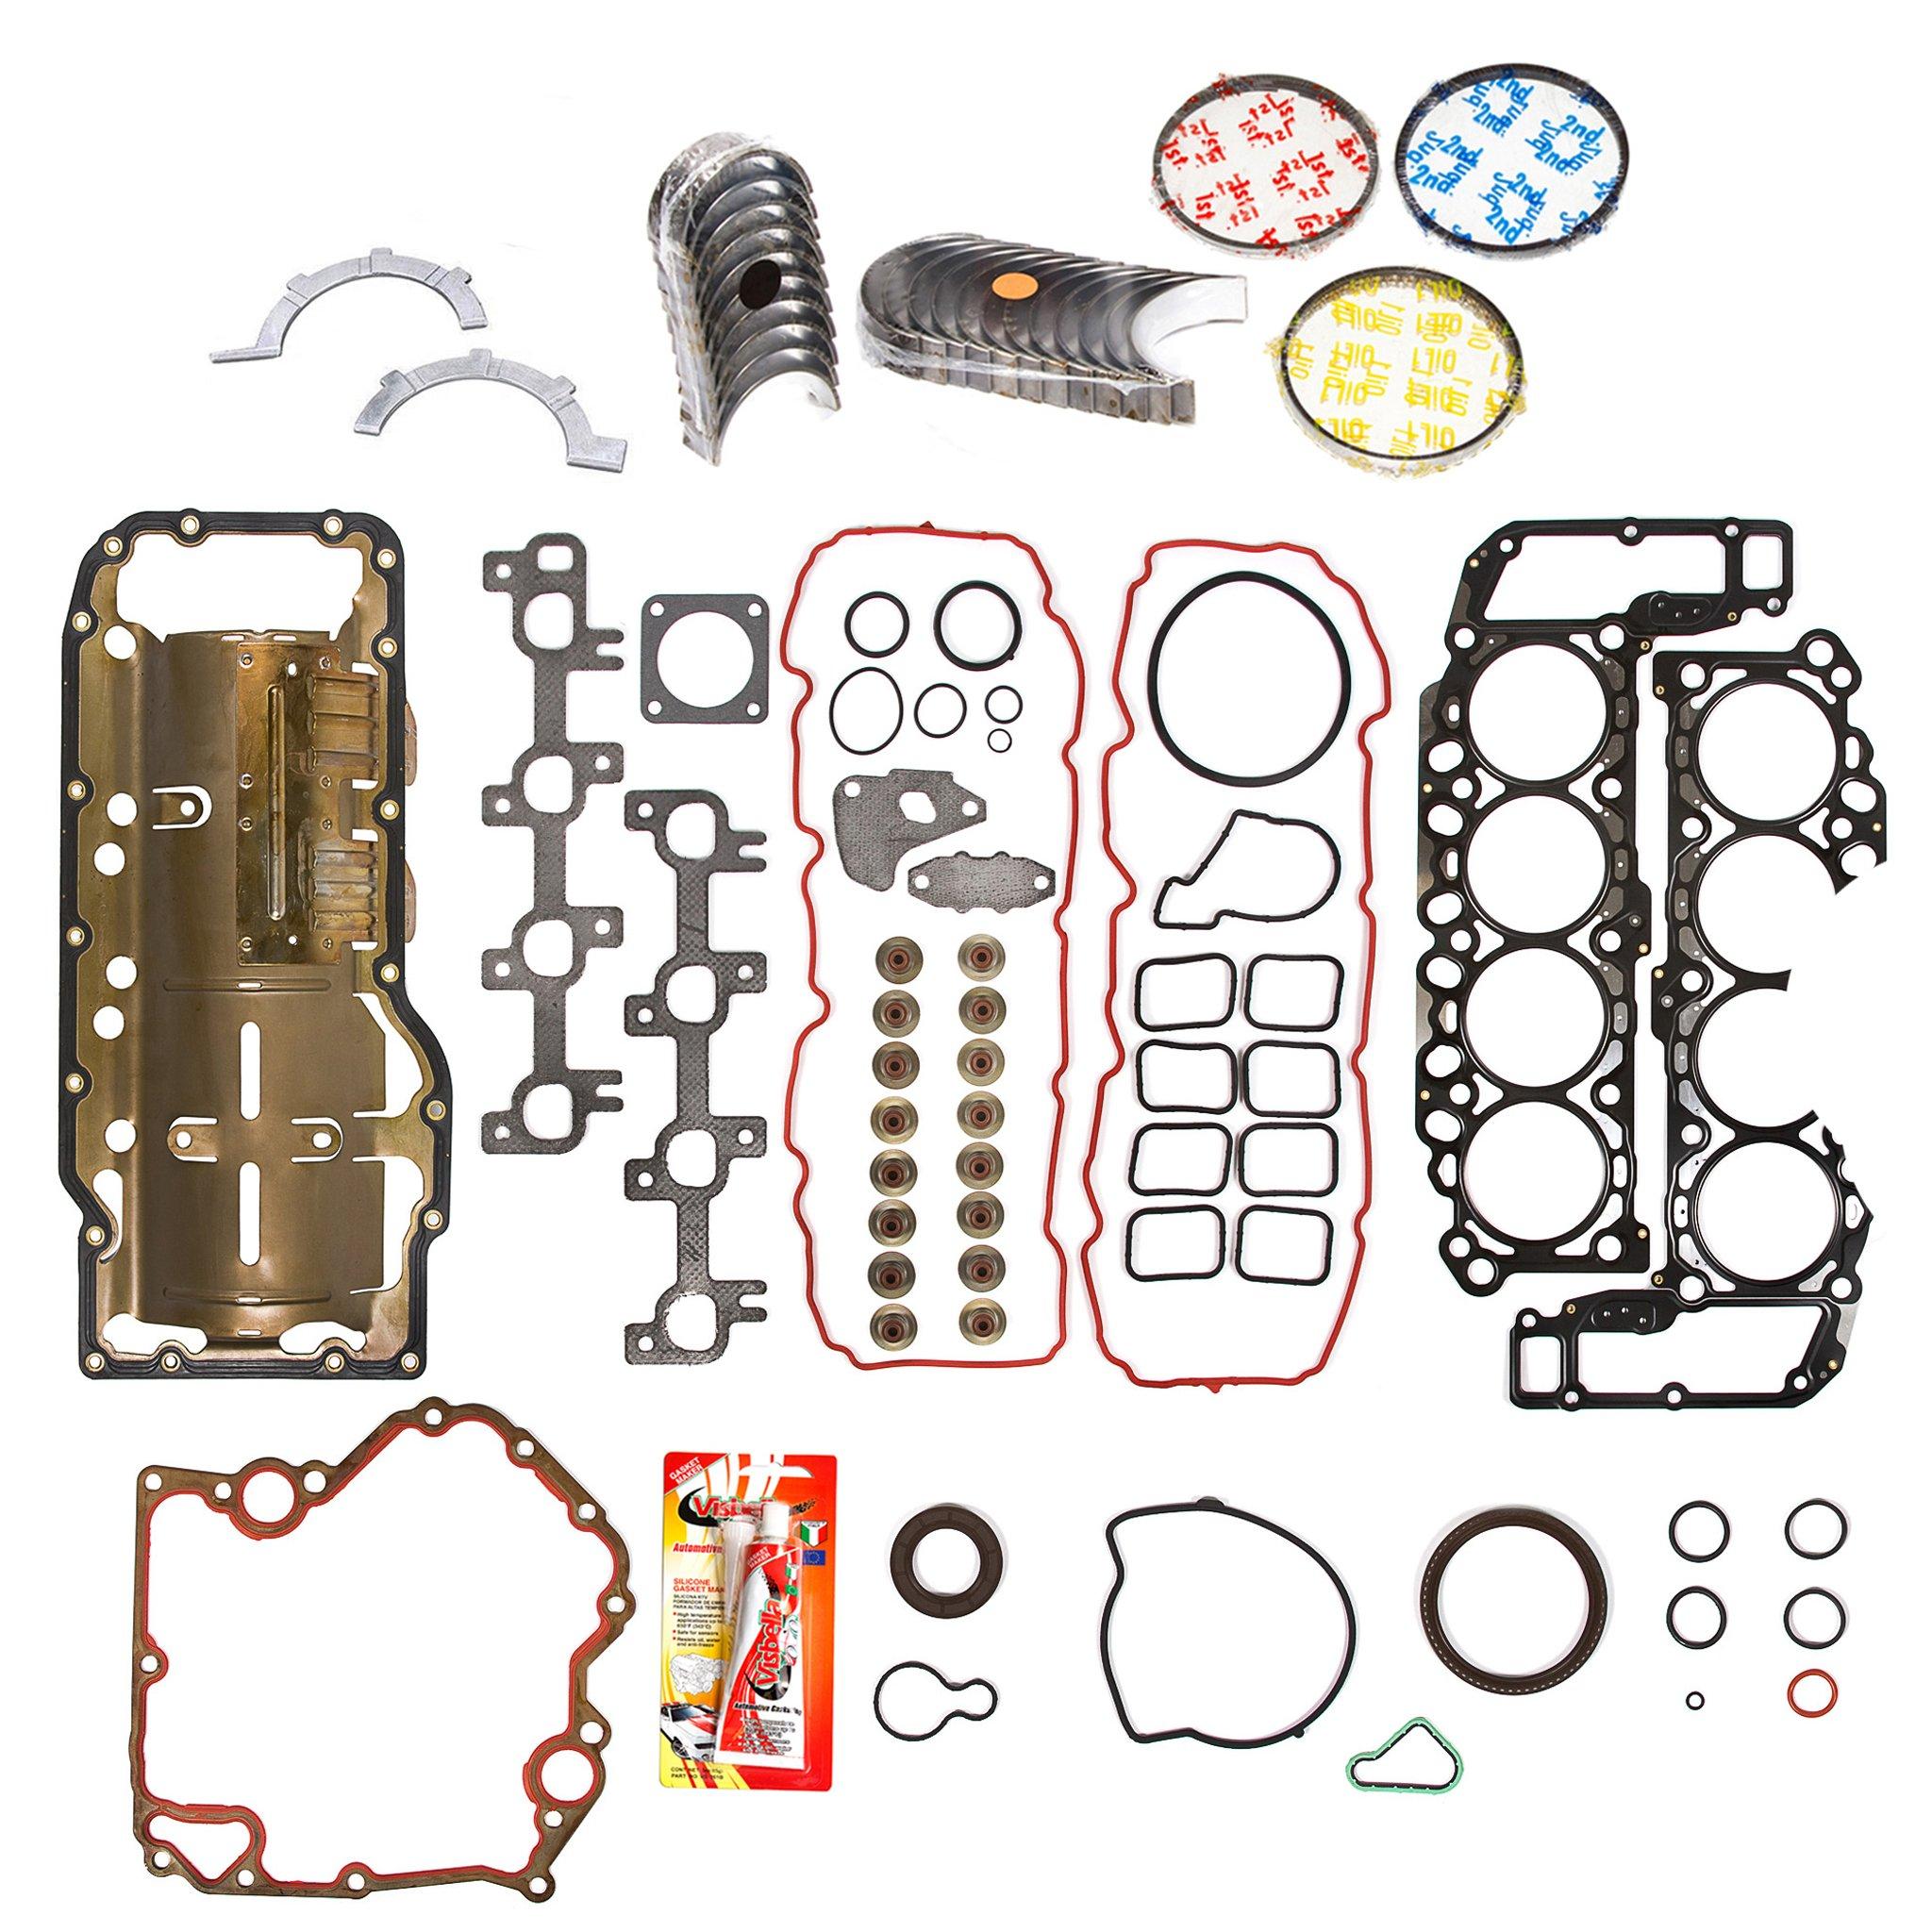 Domestic Gaskets Engine Rering Kit FSBRR8-30400EVE 99-03 Dodge Dakota Durango Jeep 4.7 SOHC Full Gasket Set, 0.25mm / 0.010'' Oversize Main Rod Bearings, 0.50mm / 0.020'' Oversize Piston Rings